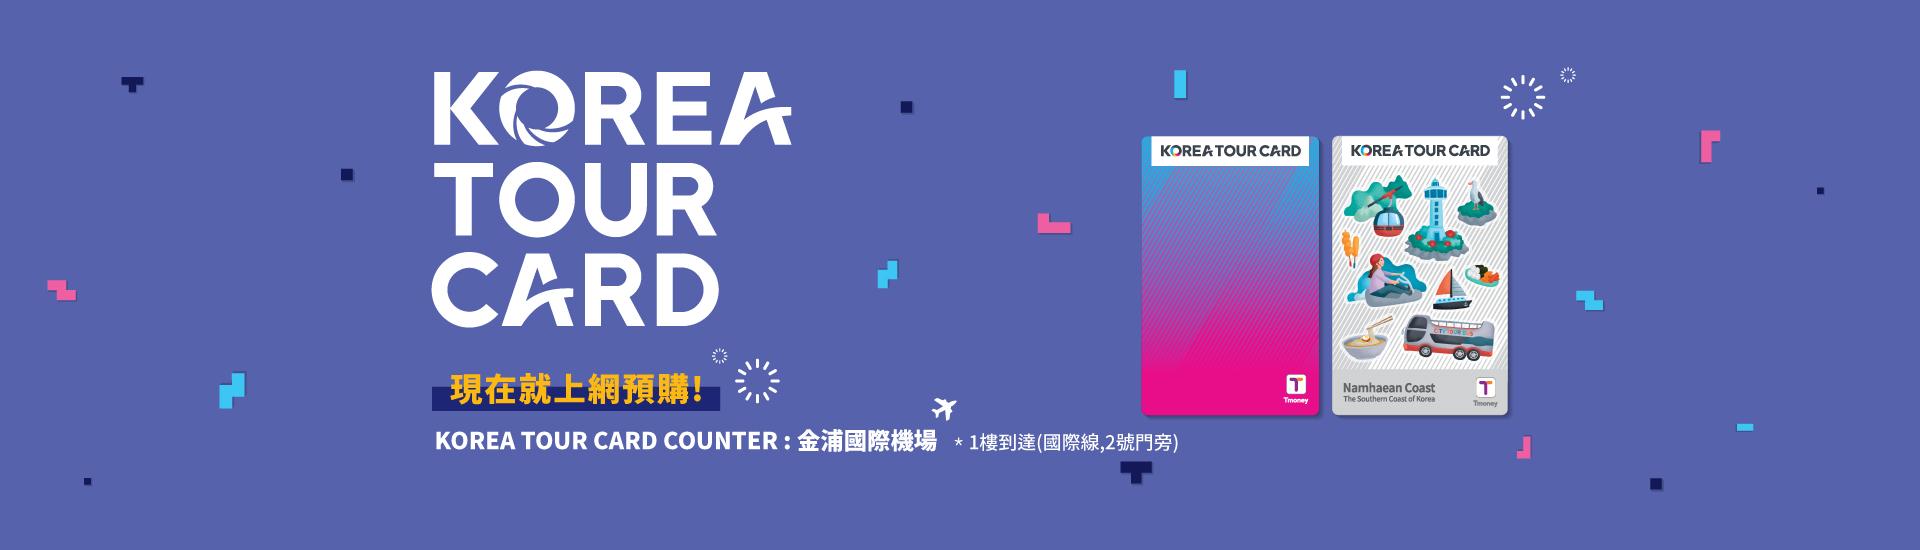 KOREA TOUR CARD Online reservation service